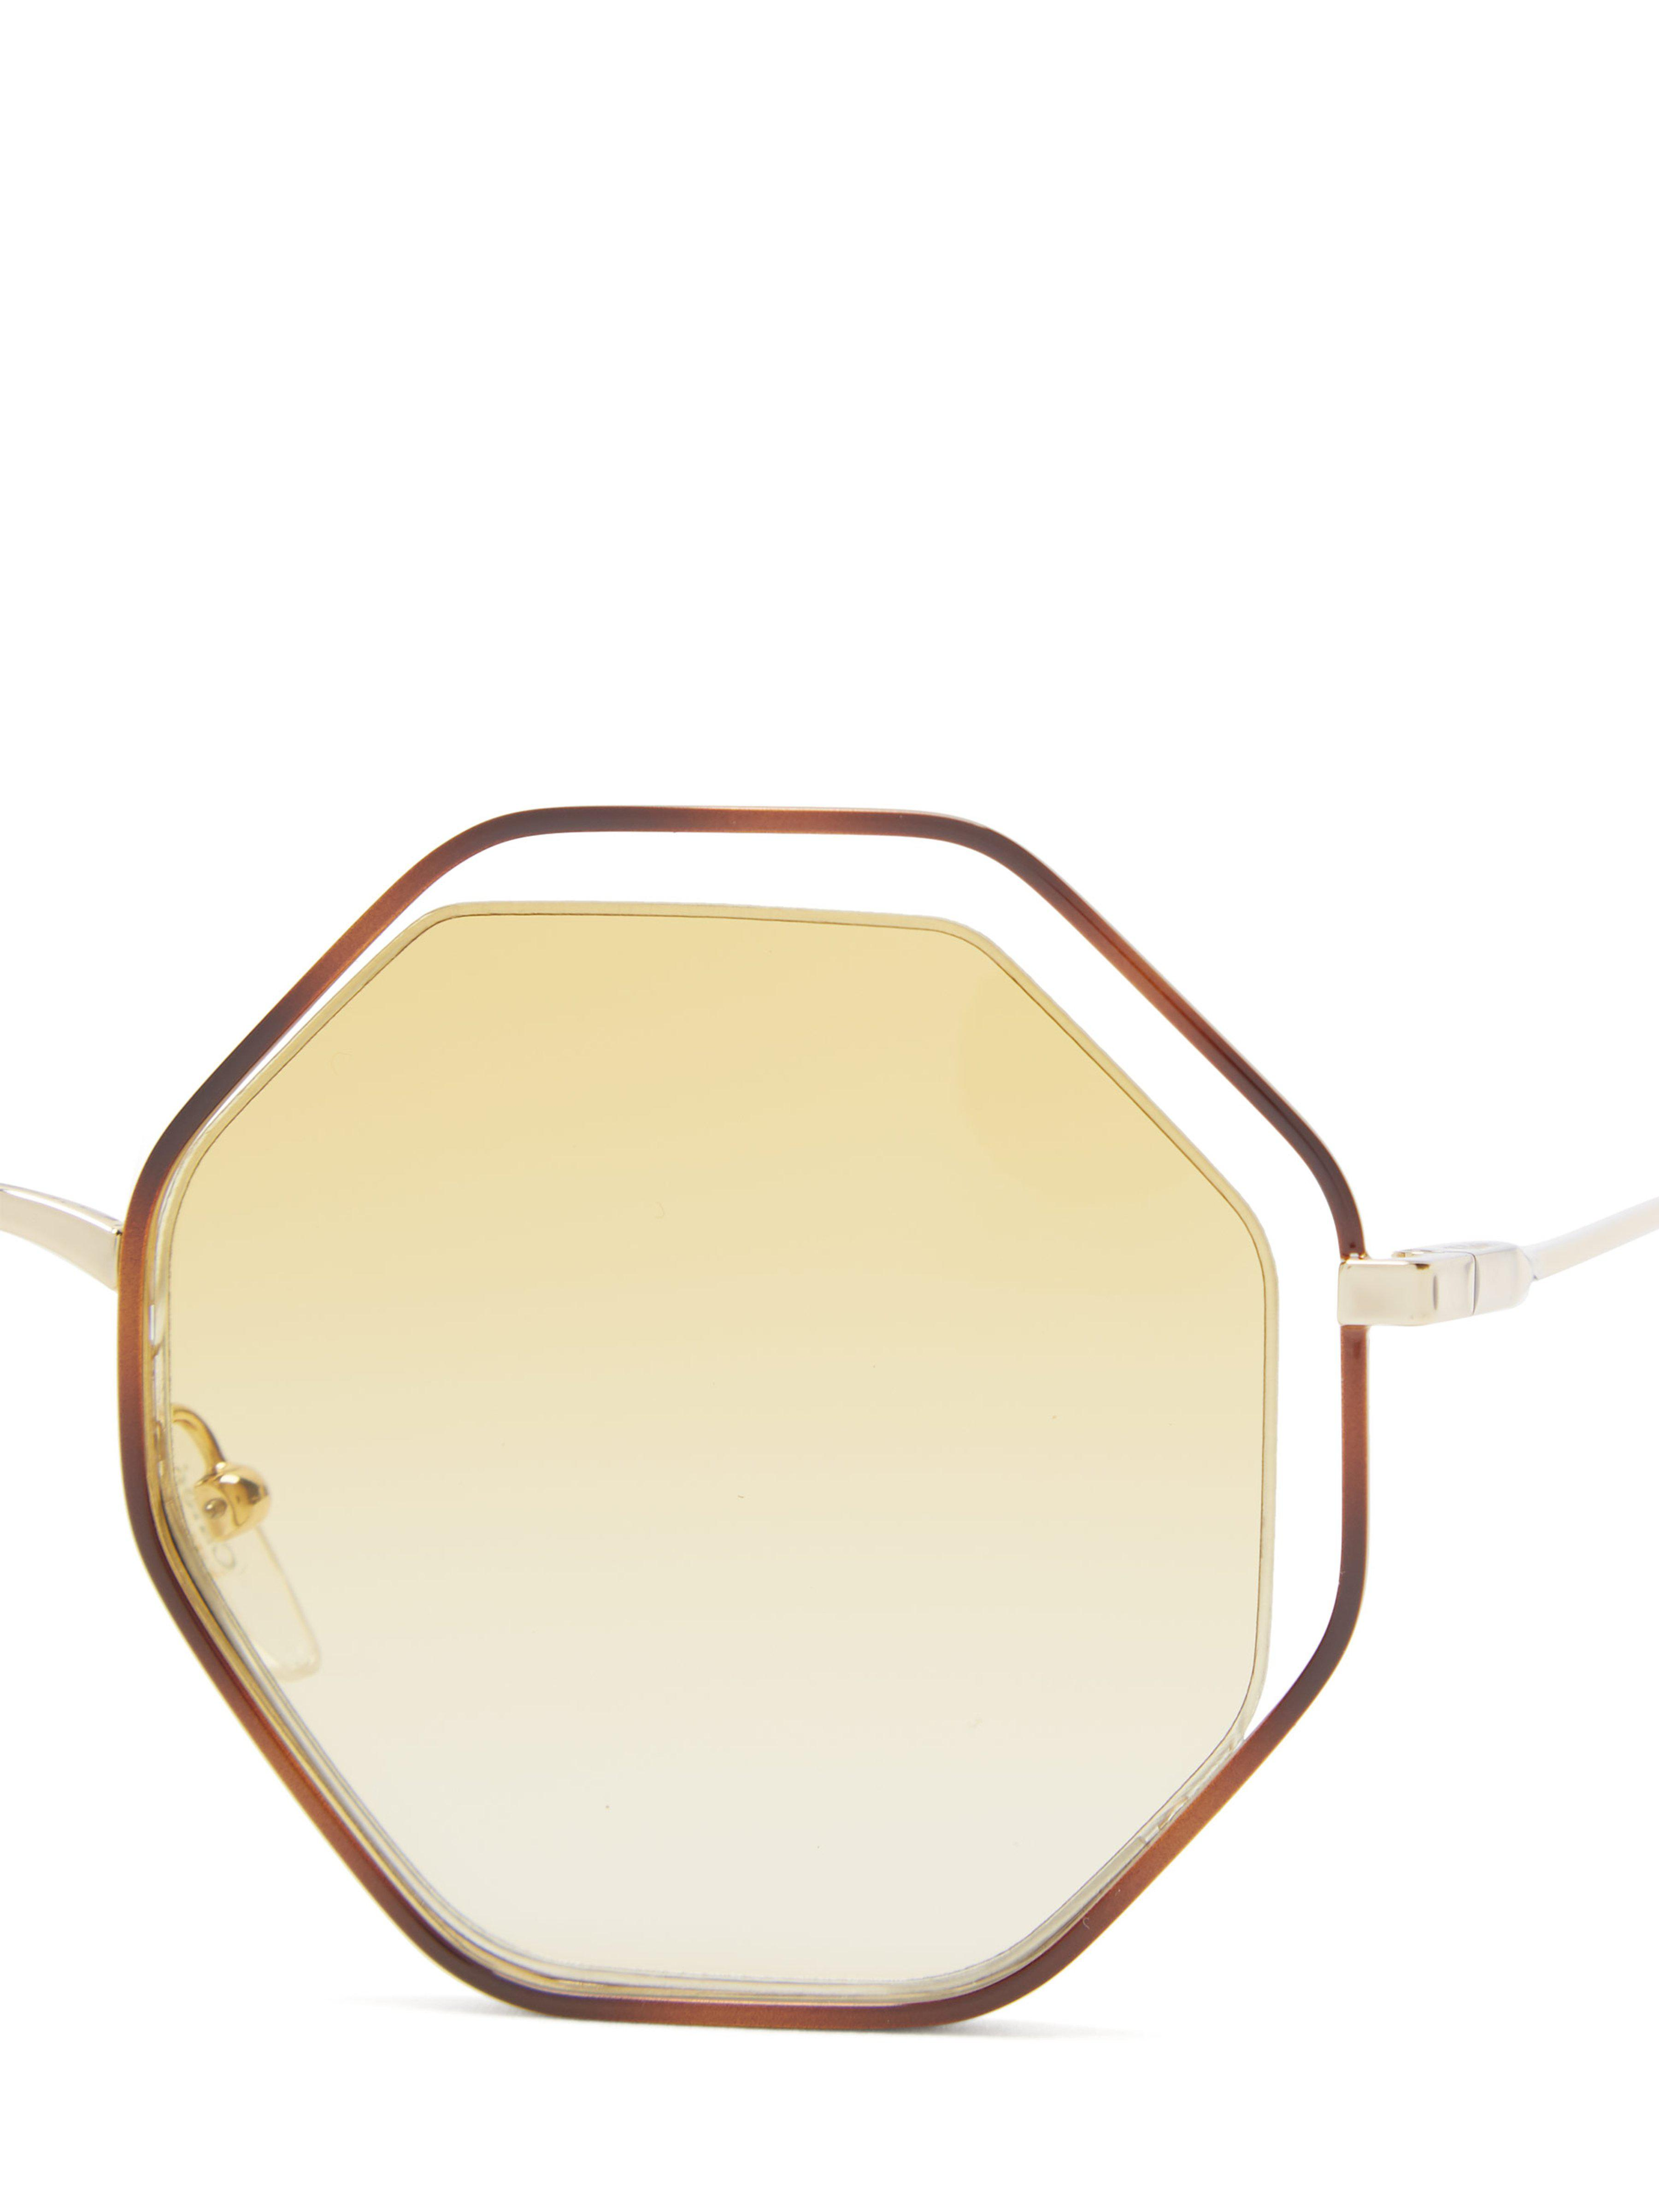 95960d3e263 Chloé - Yellow Poppy Octagonal Framed Sunglasses - Lyst. View fullscreen